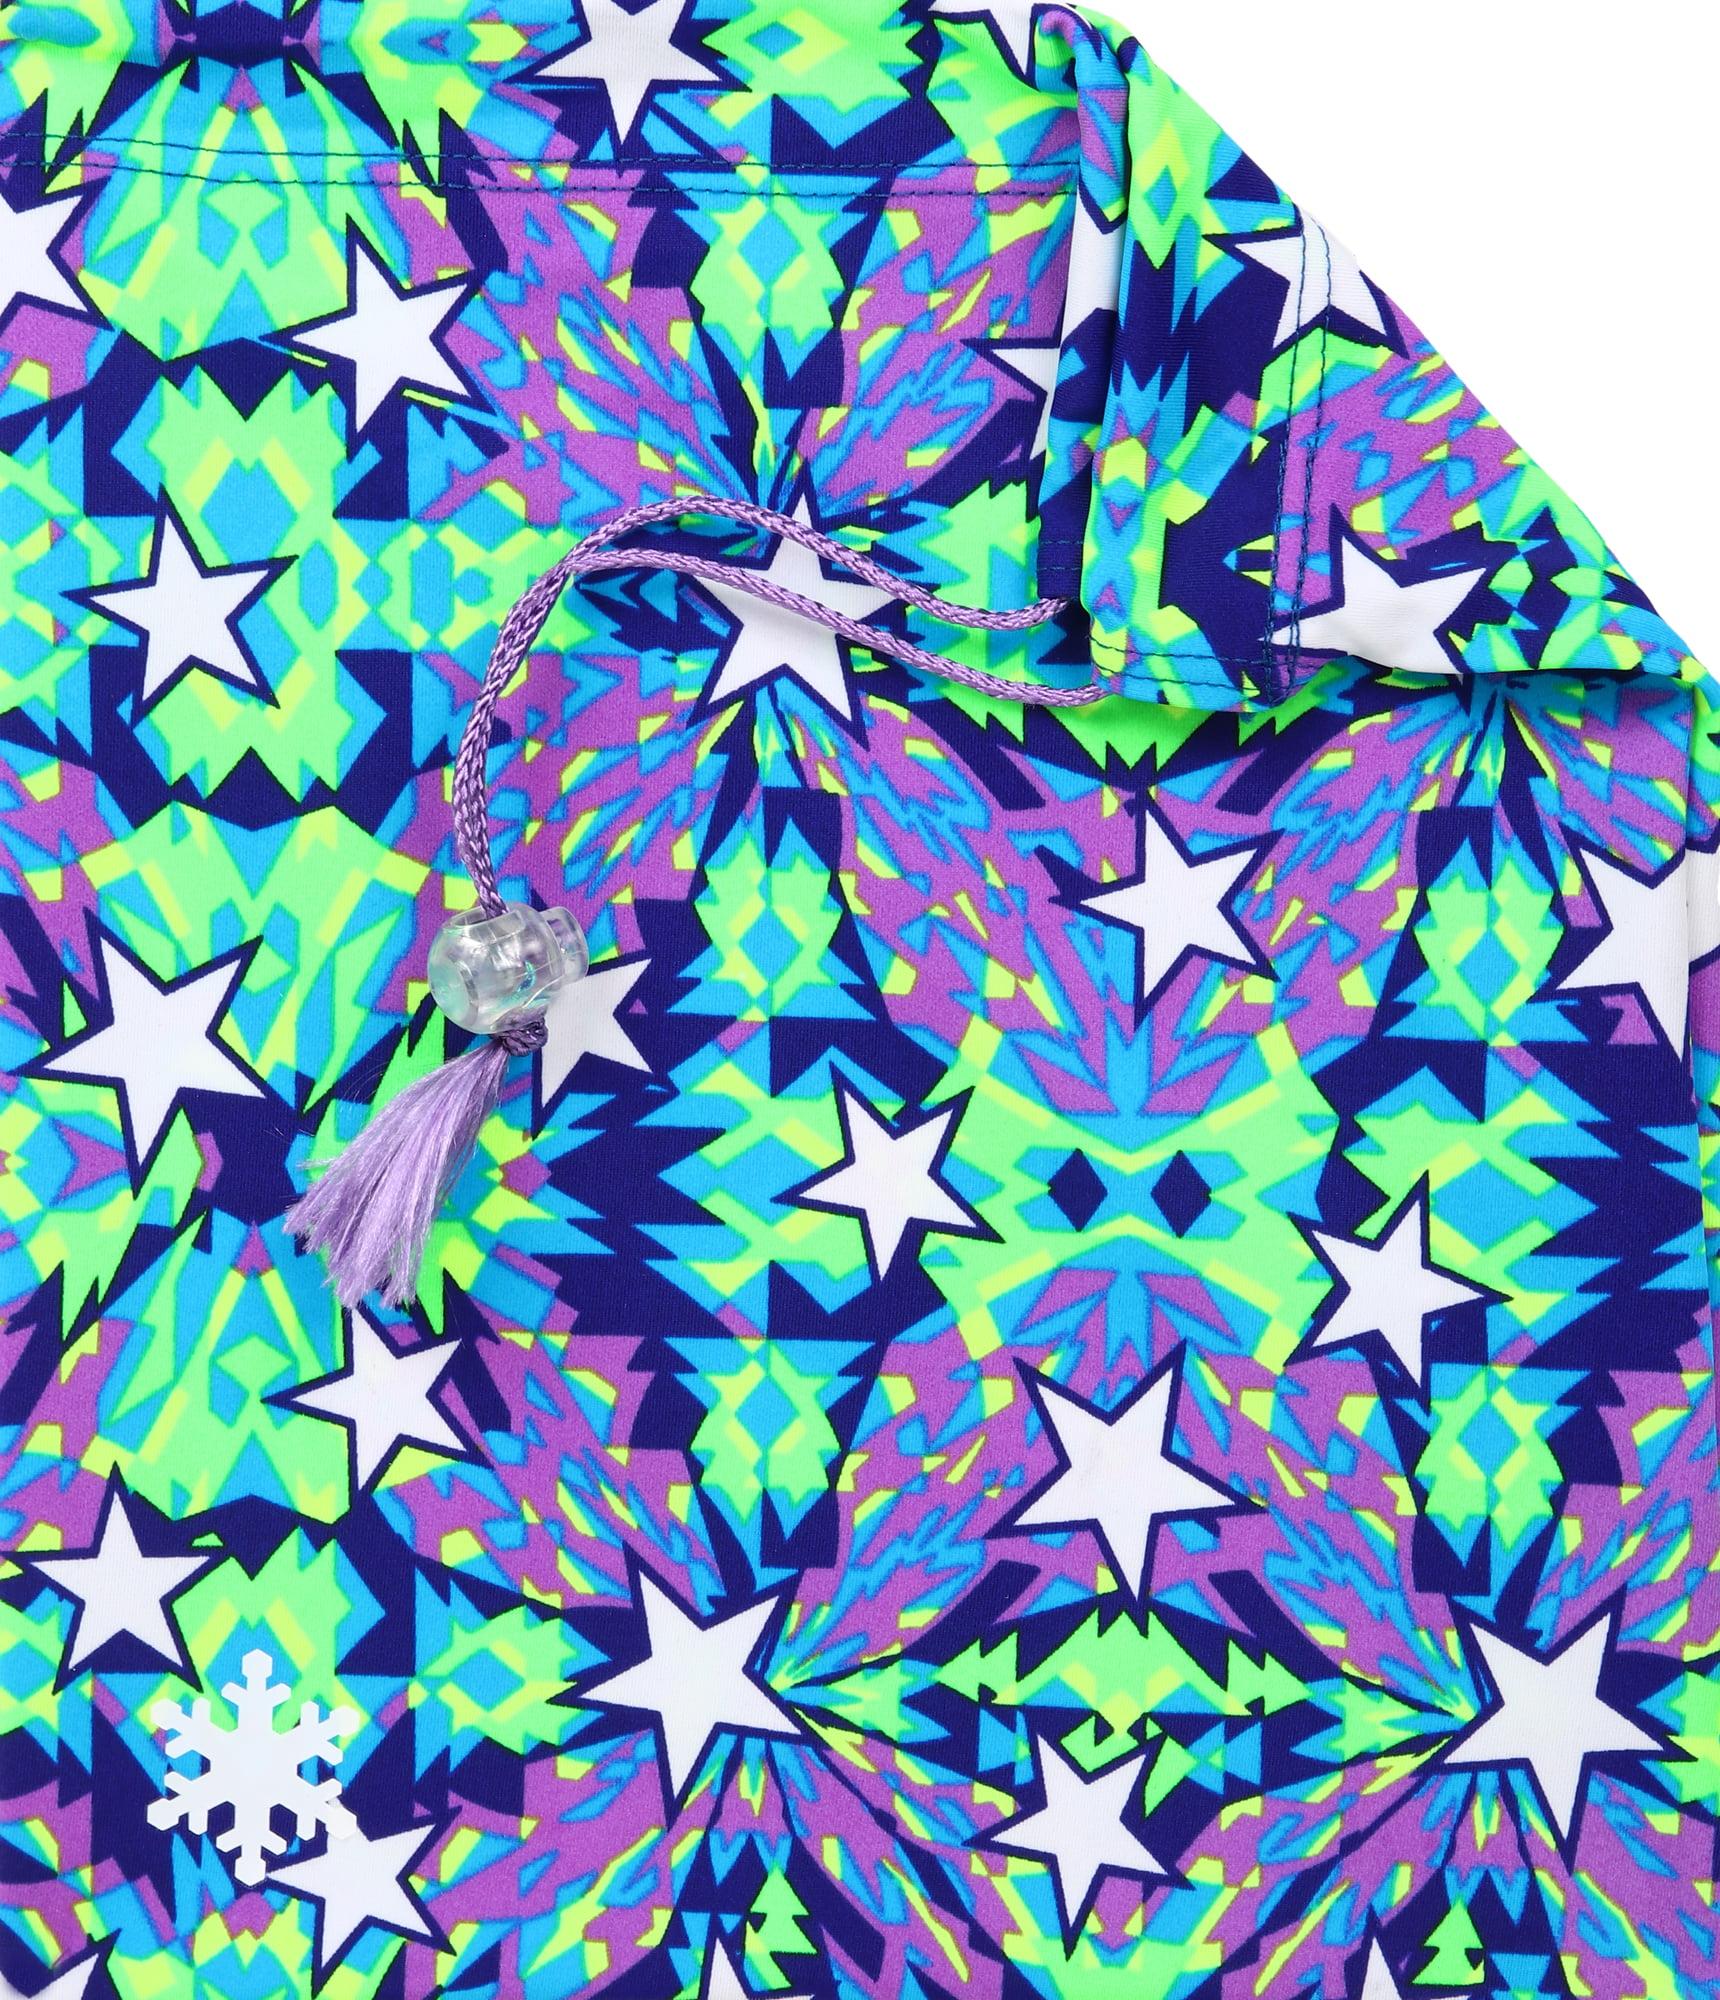 Kaleidoscope Ca: Kaleidoscope Gymnastics Grip Bag